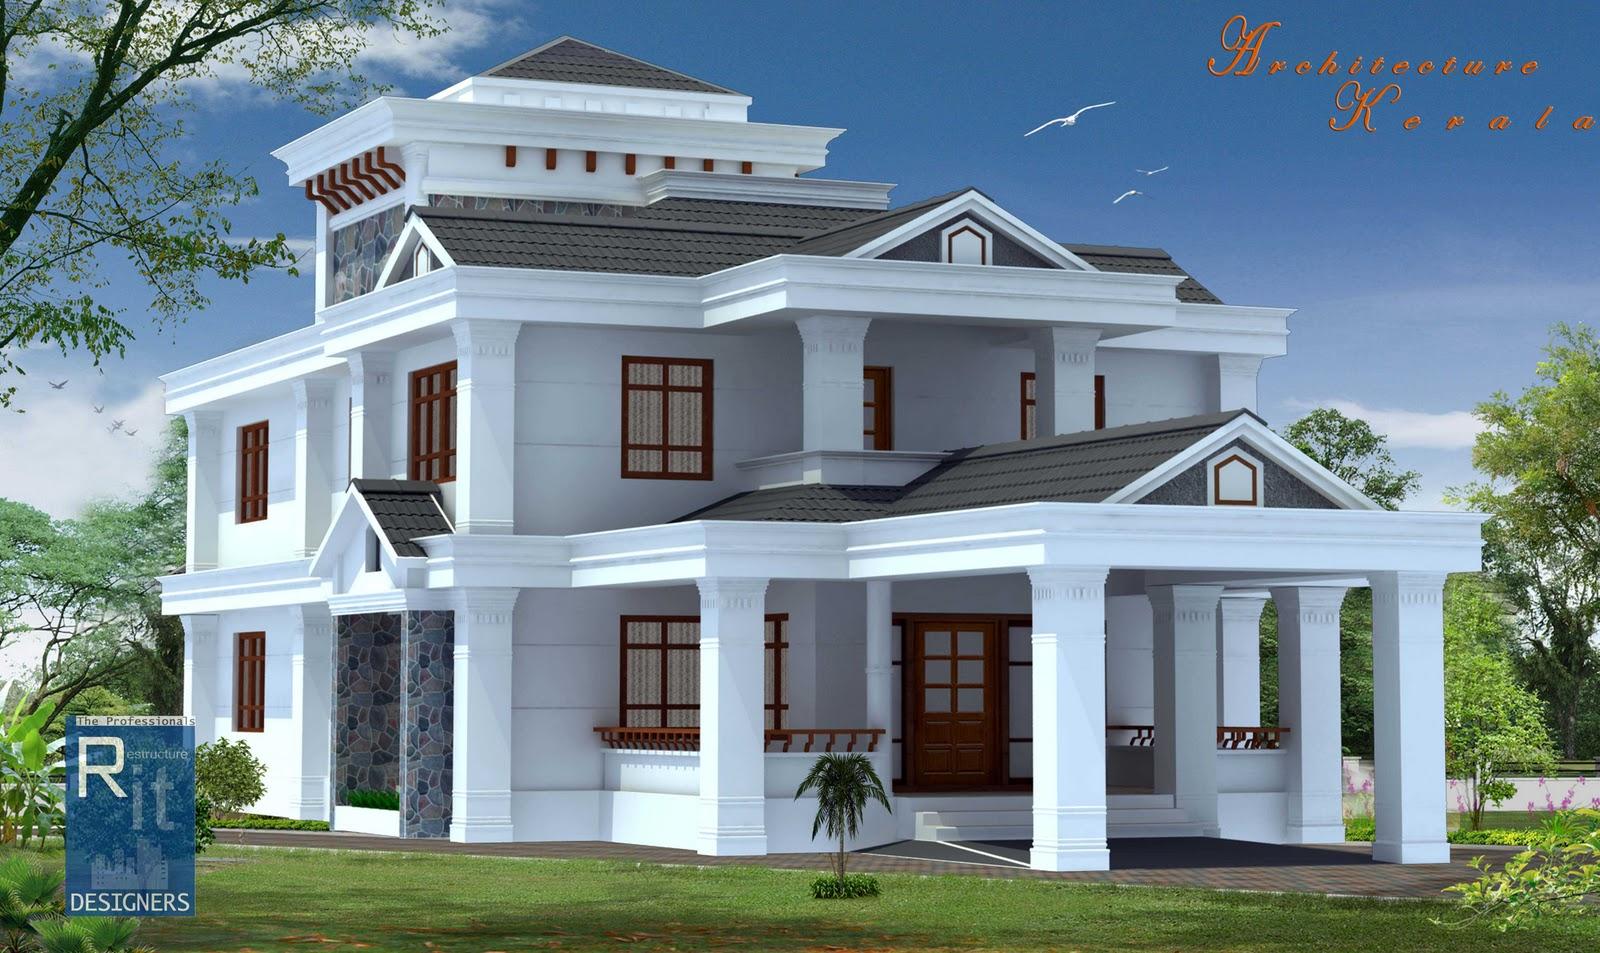 4 BED ROOM KERALA HOUSE - ARCHITECTURE KERALA